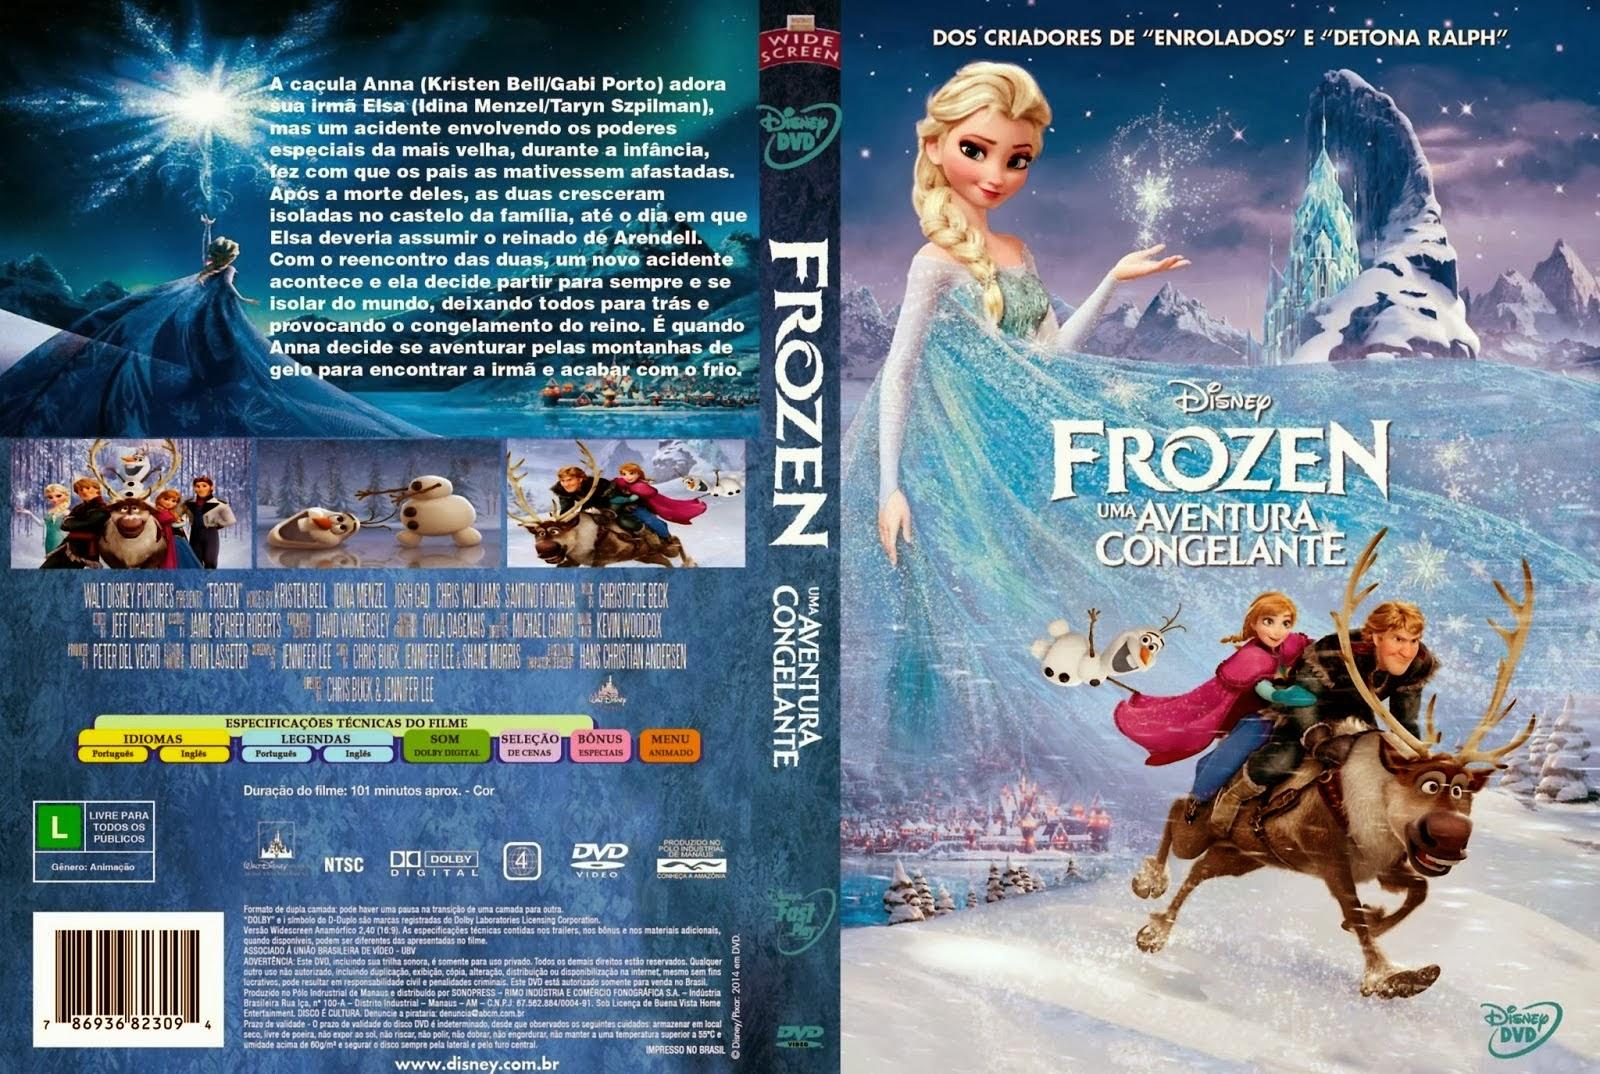 Imagens Frozen Uma Aventura Congelante Best telona capas: frozen uma aventura congelante